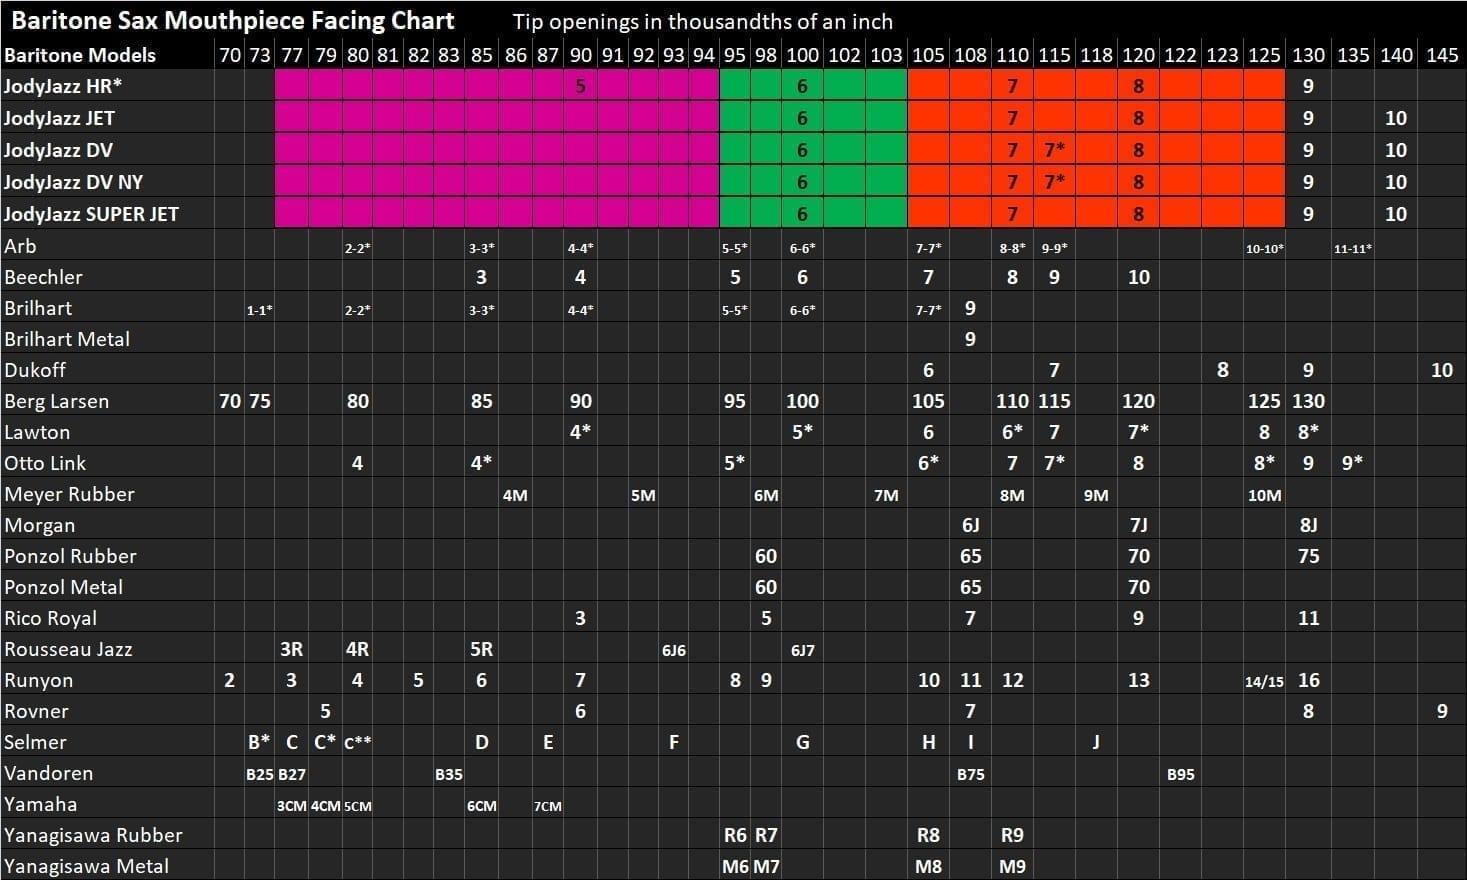 JodyJazz Baritone Facing Chart